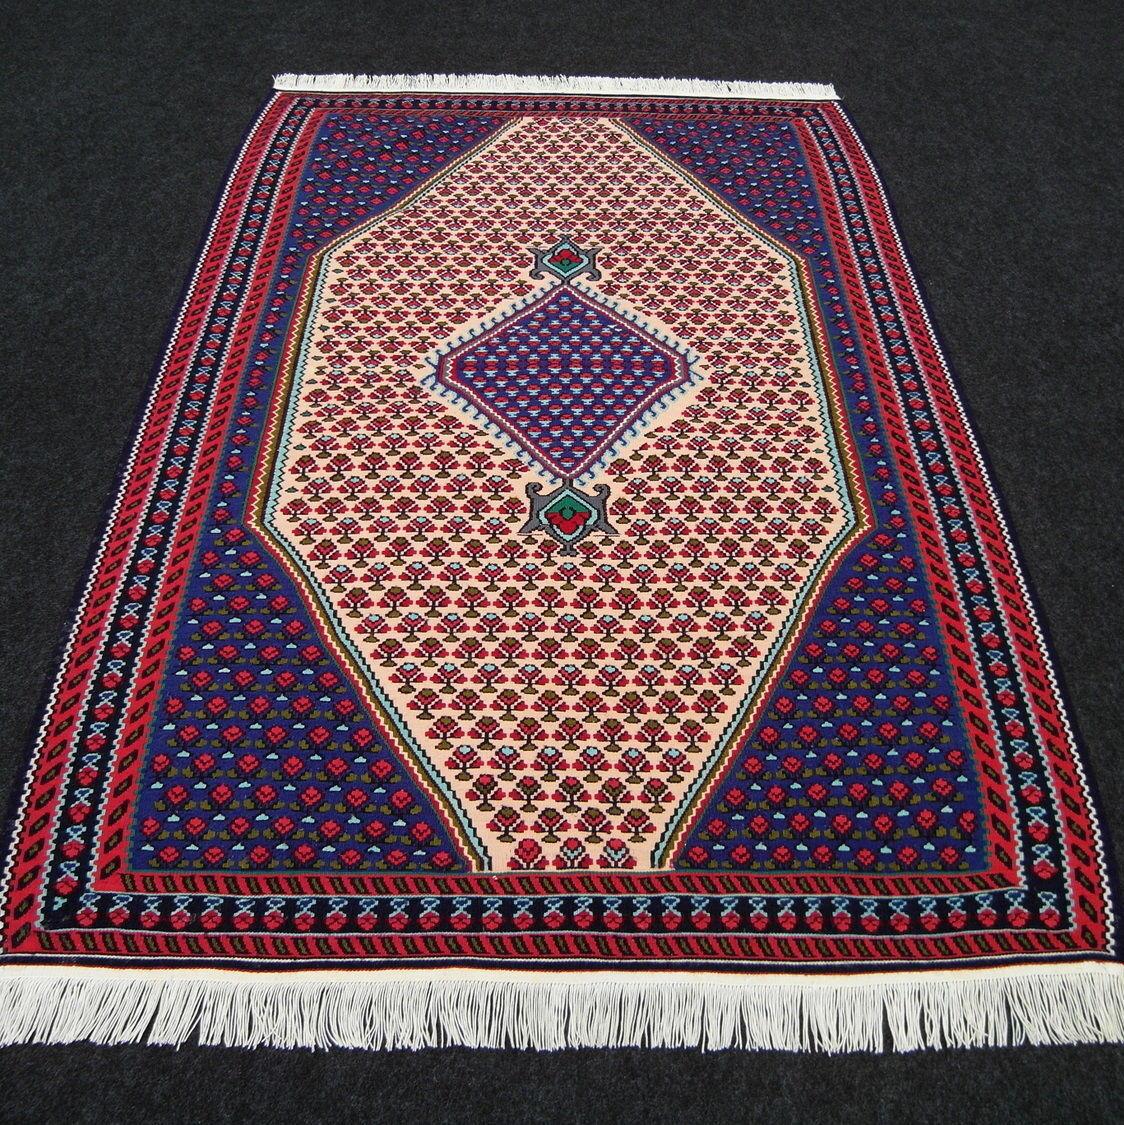 Orient alfombra Kilim 164 x 112 cm Kilim tejida alfombra persa Carpet alfombra